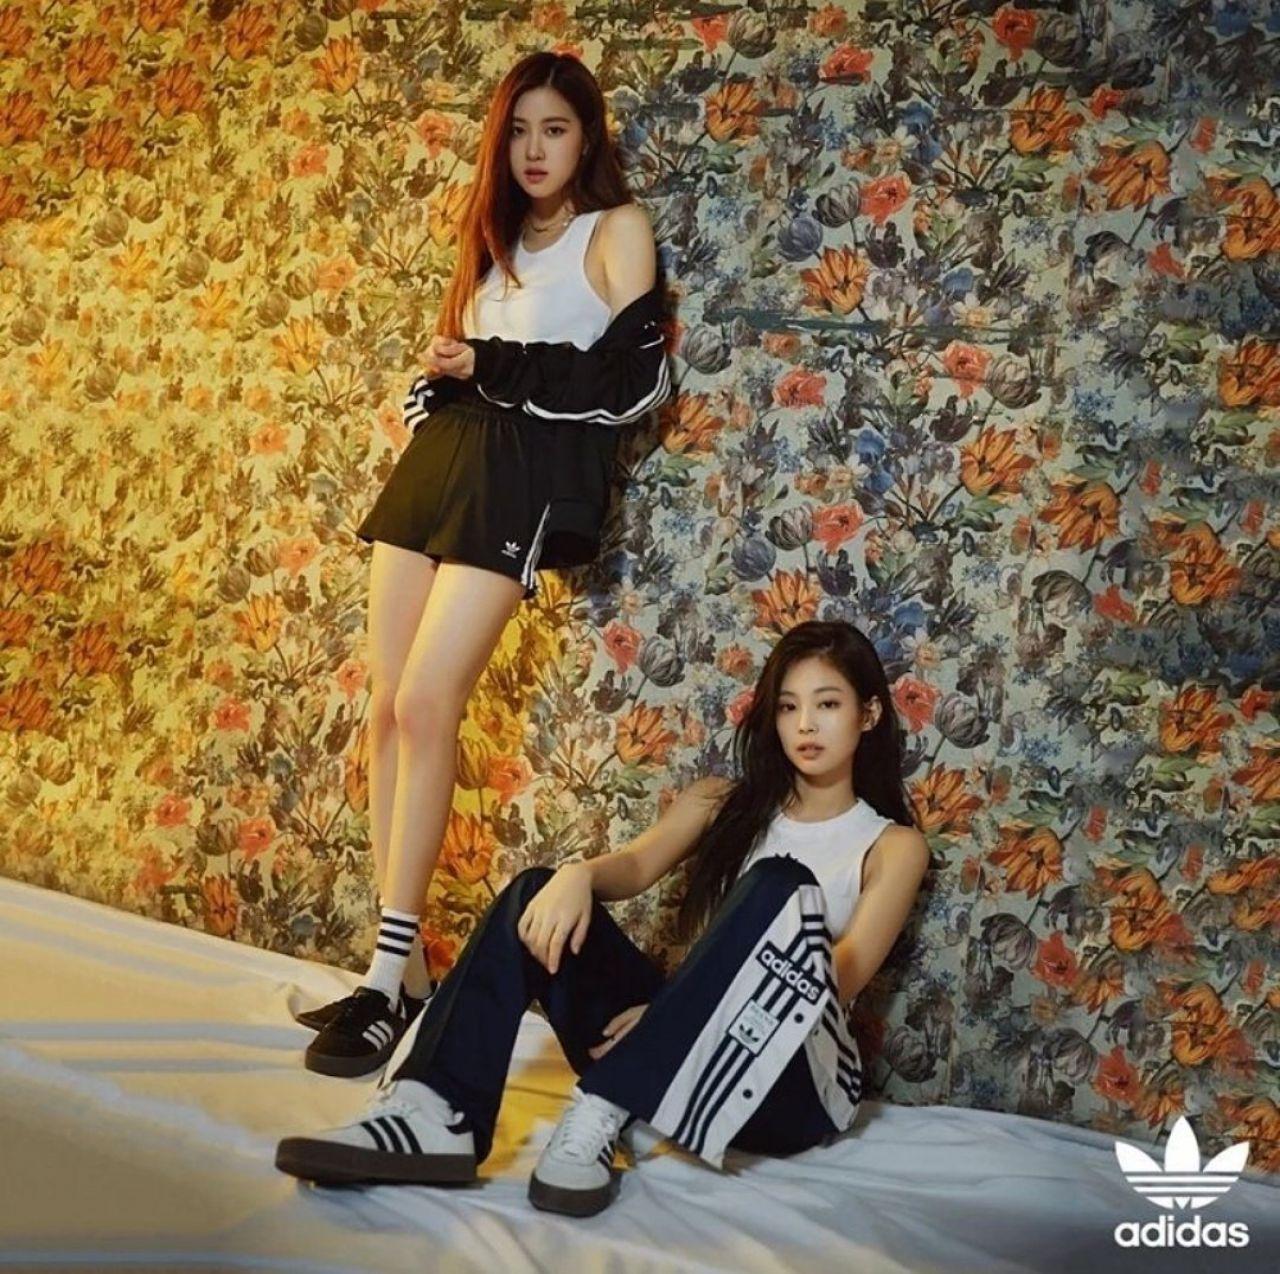 Blackpink Adidas Photoshoot 2018 Part Ii